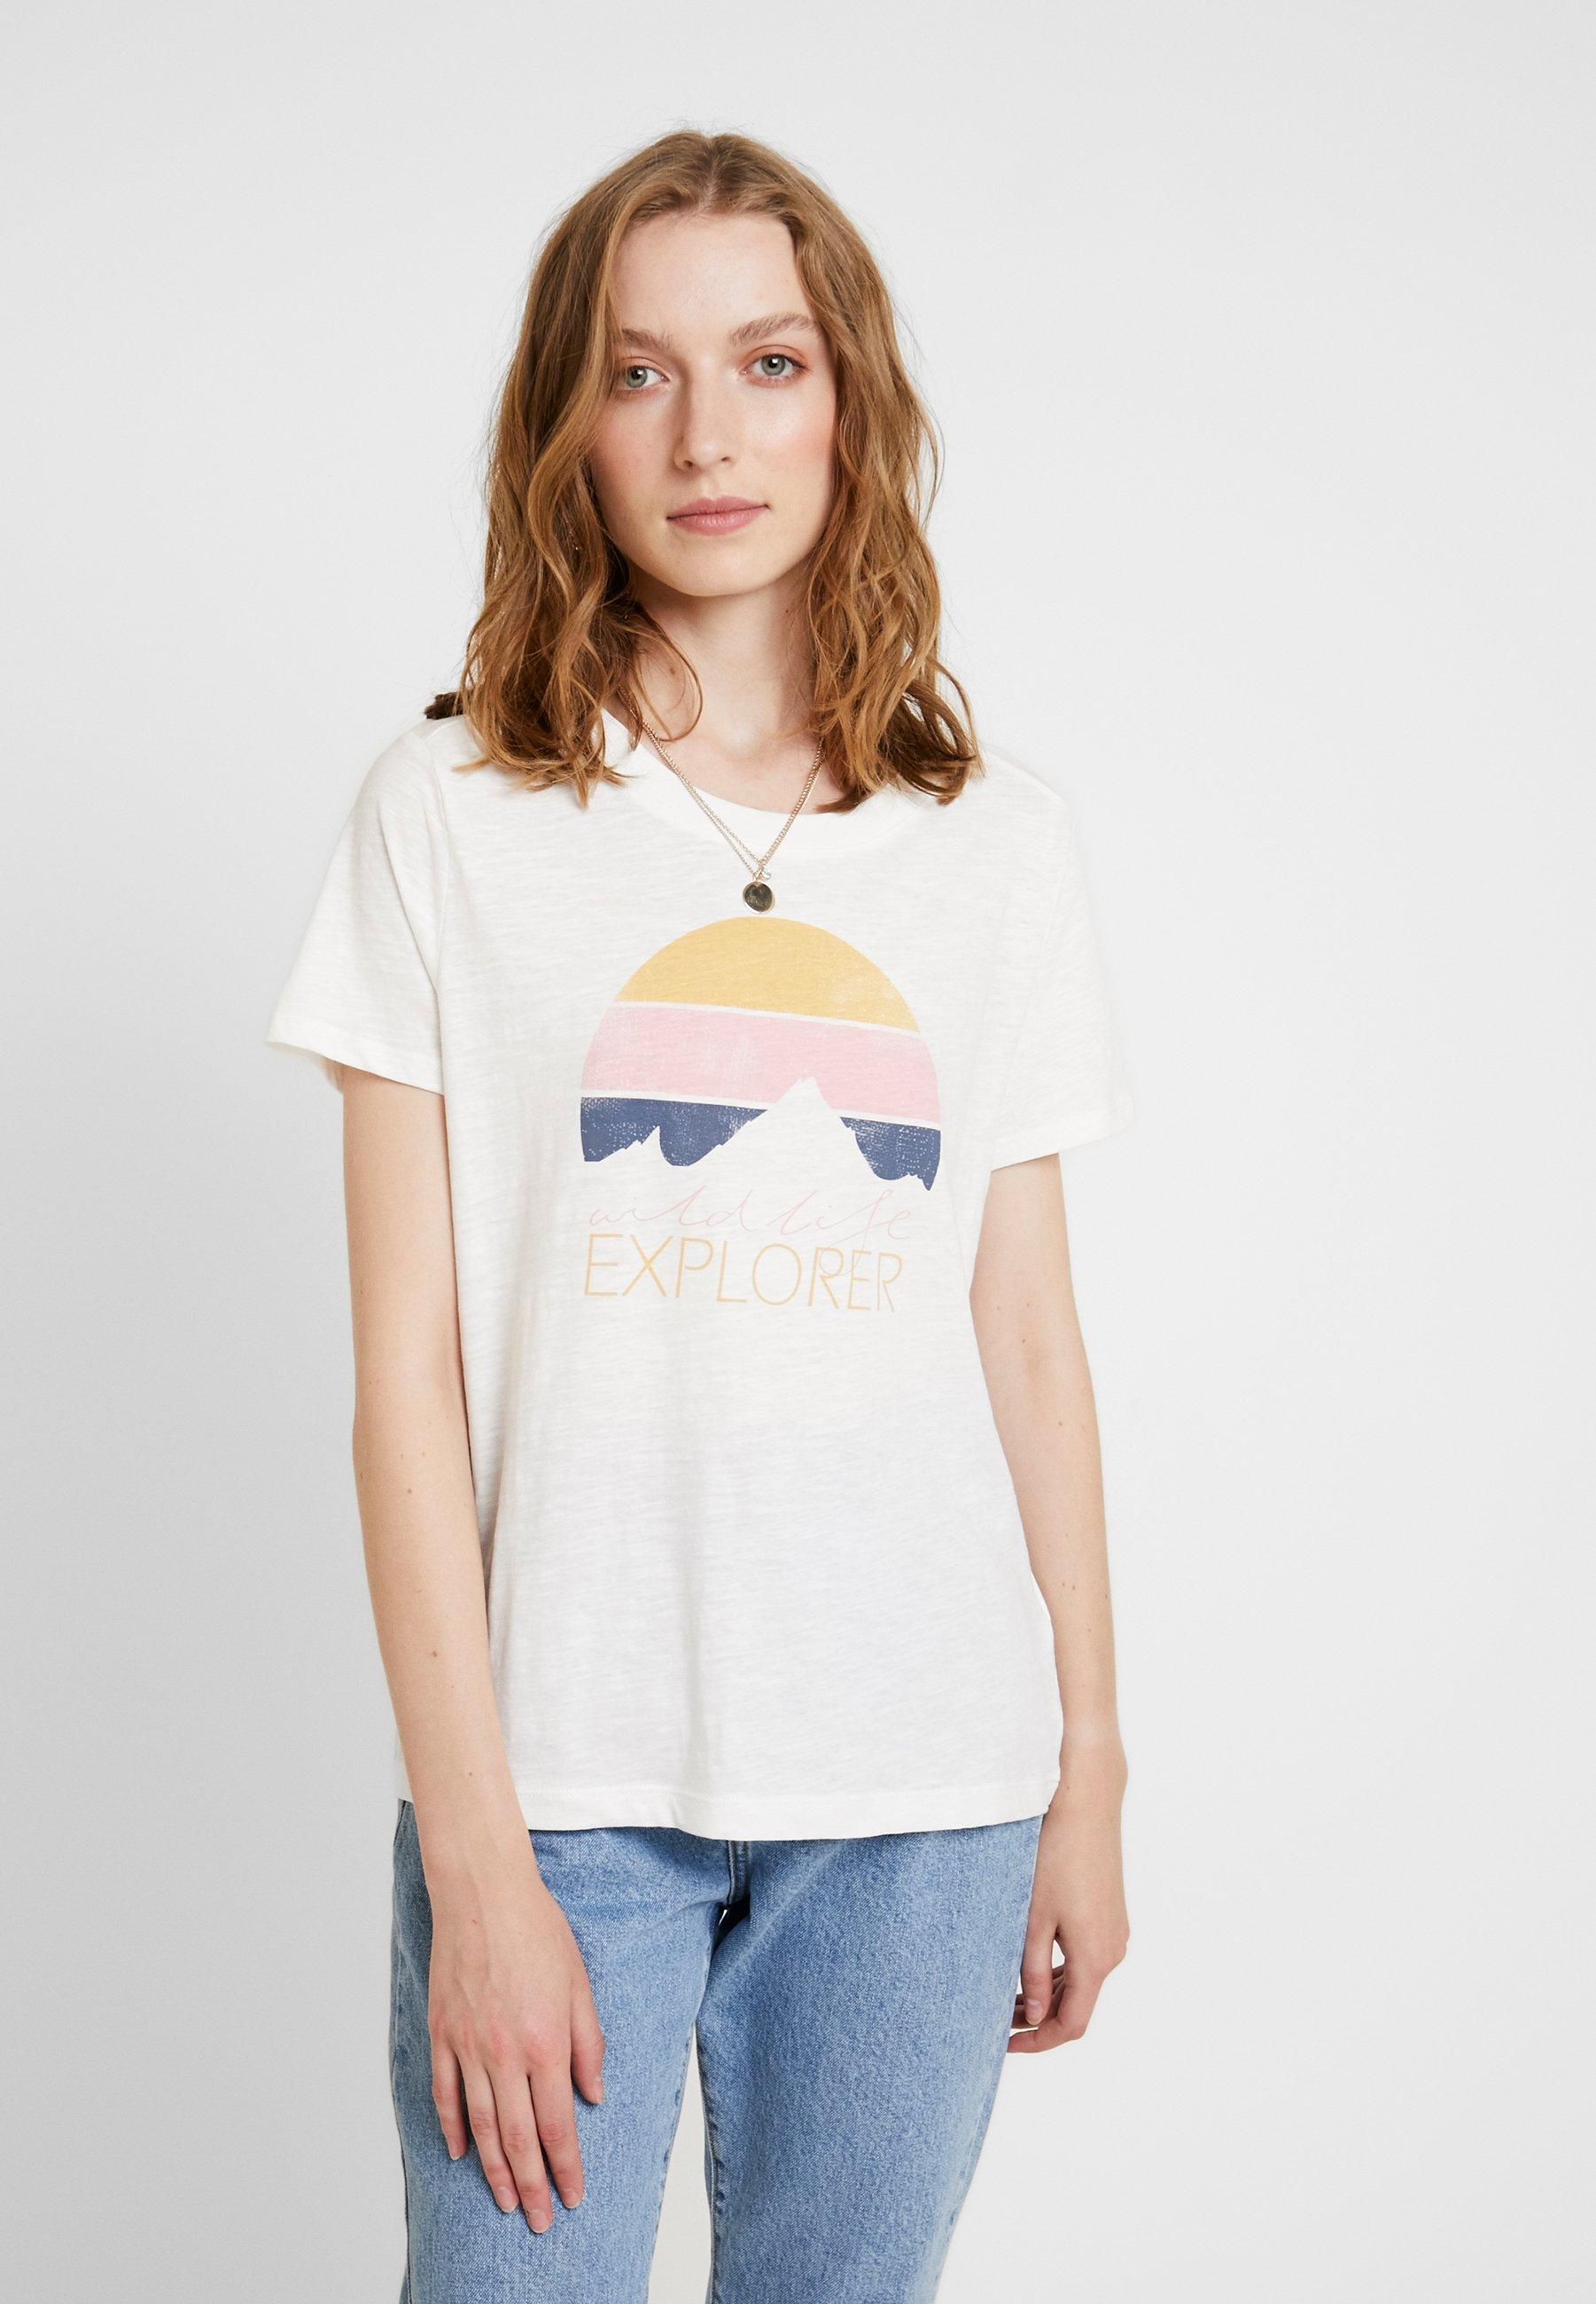 Imprimé shirt S KurzarmT oliver Cream zUMVSp